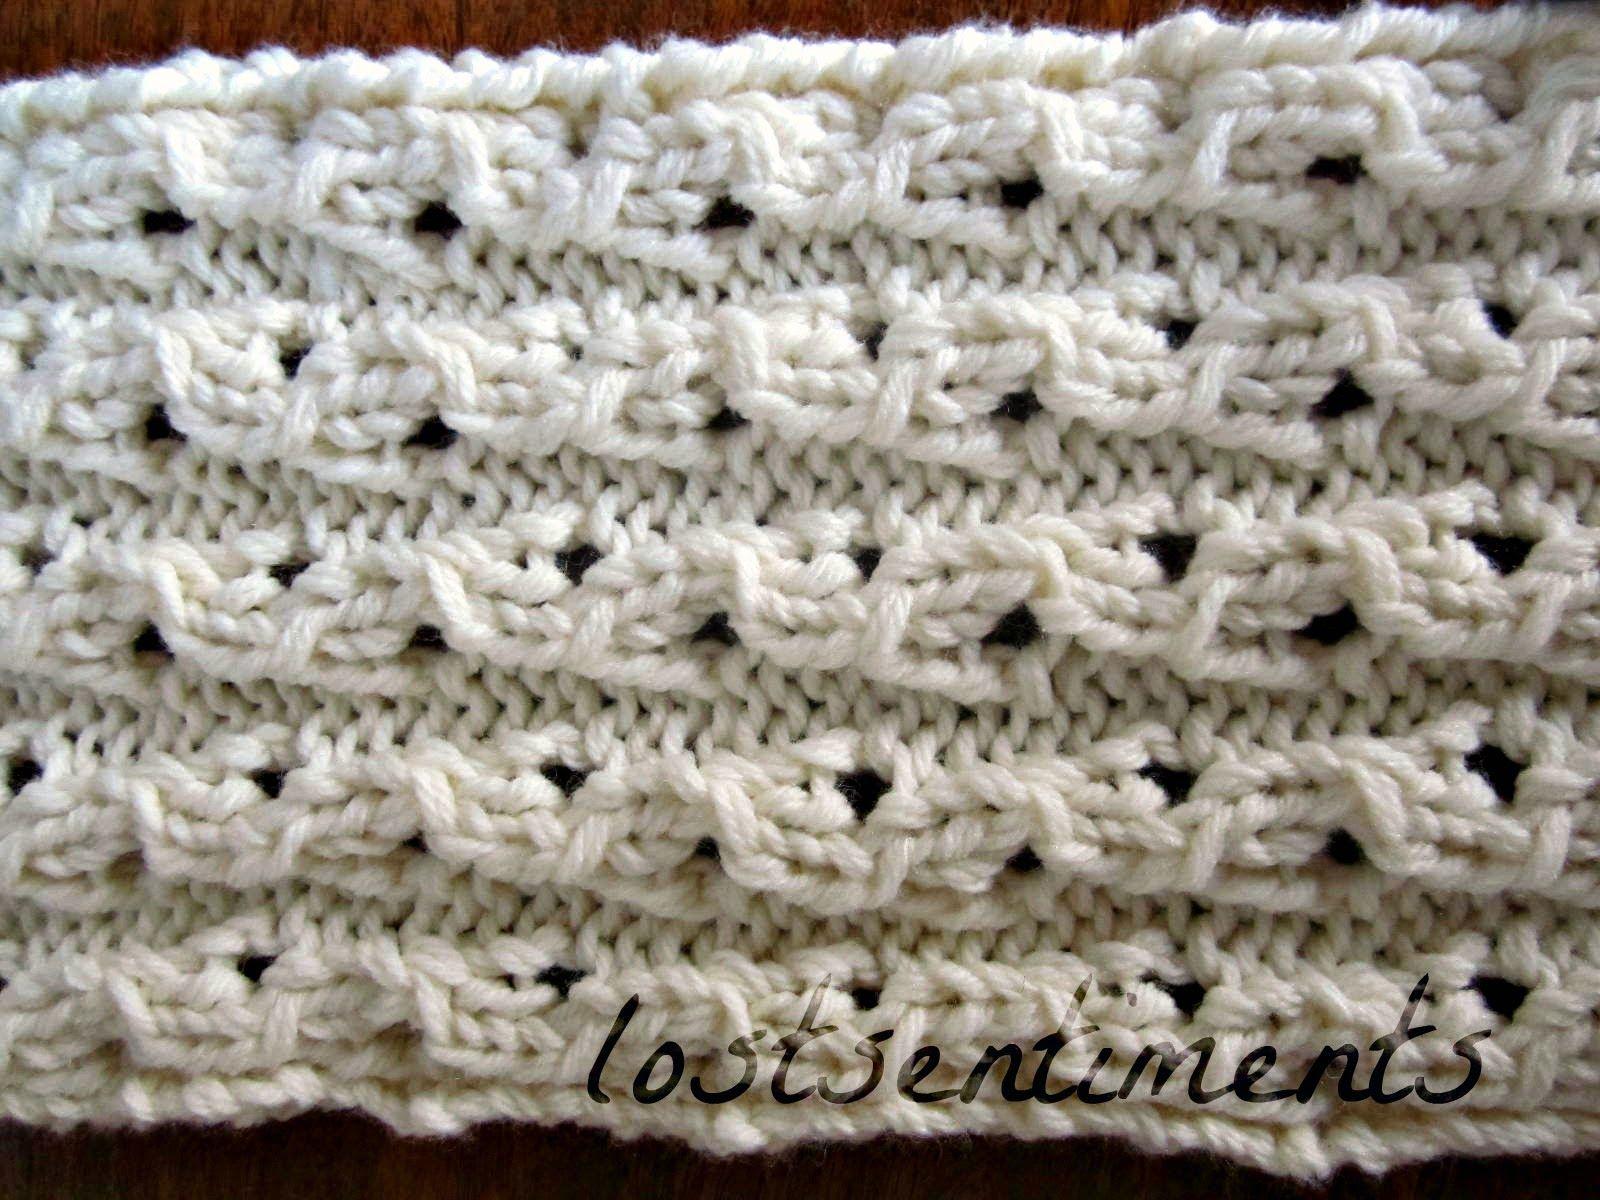 Lostsentiments coconut milk peekaboo lace scarf pattern free lostsentiments coconut milk peekaboo lace scarf pattern free knitting pattern bankloansurffo Choice Image